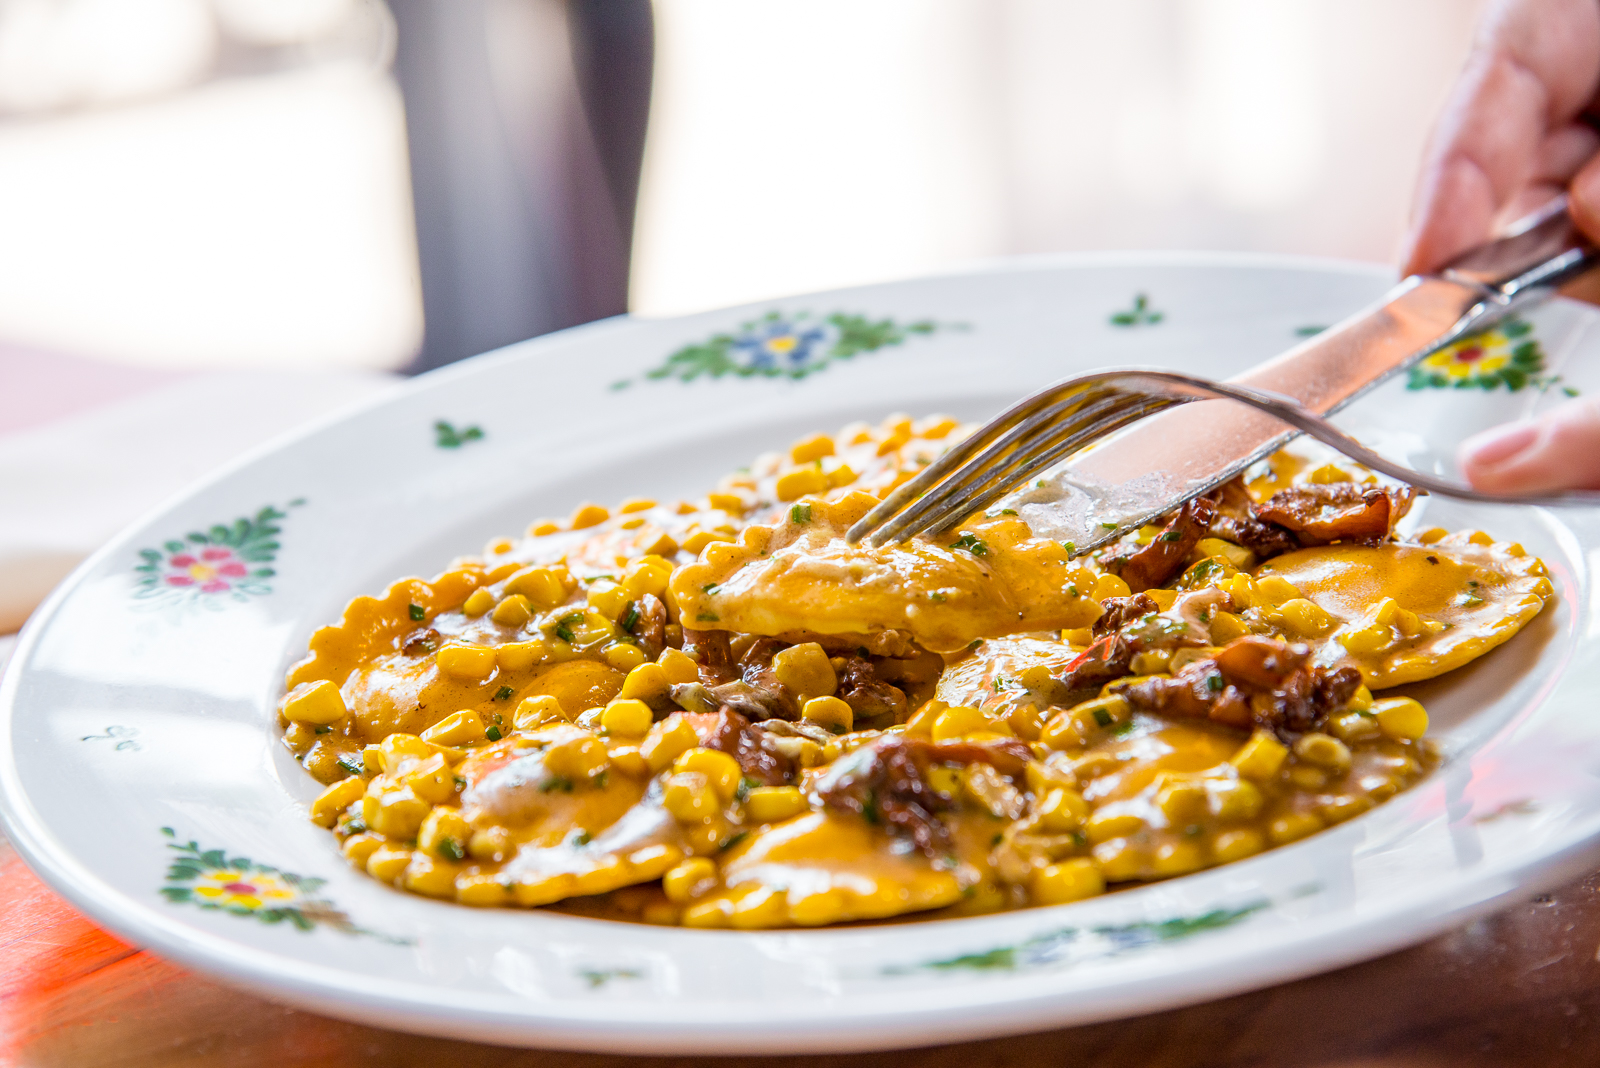 Seasonal ravioli with corn from Osteria Morini